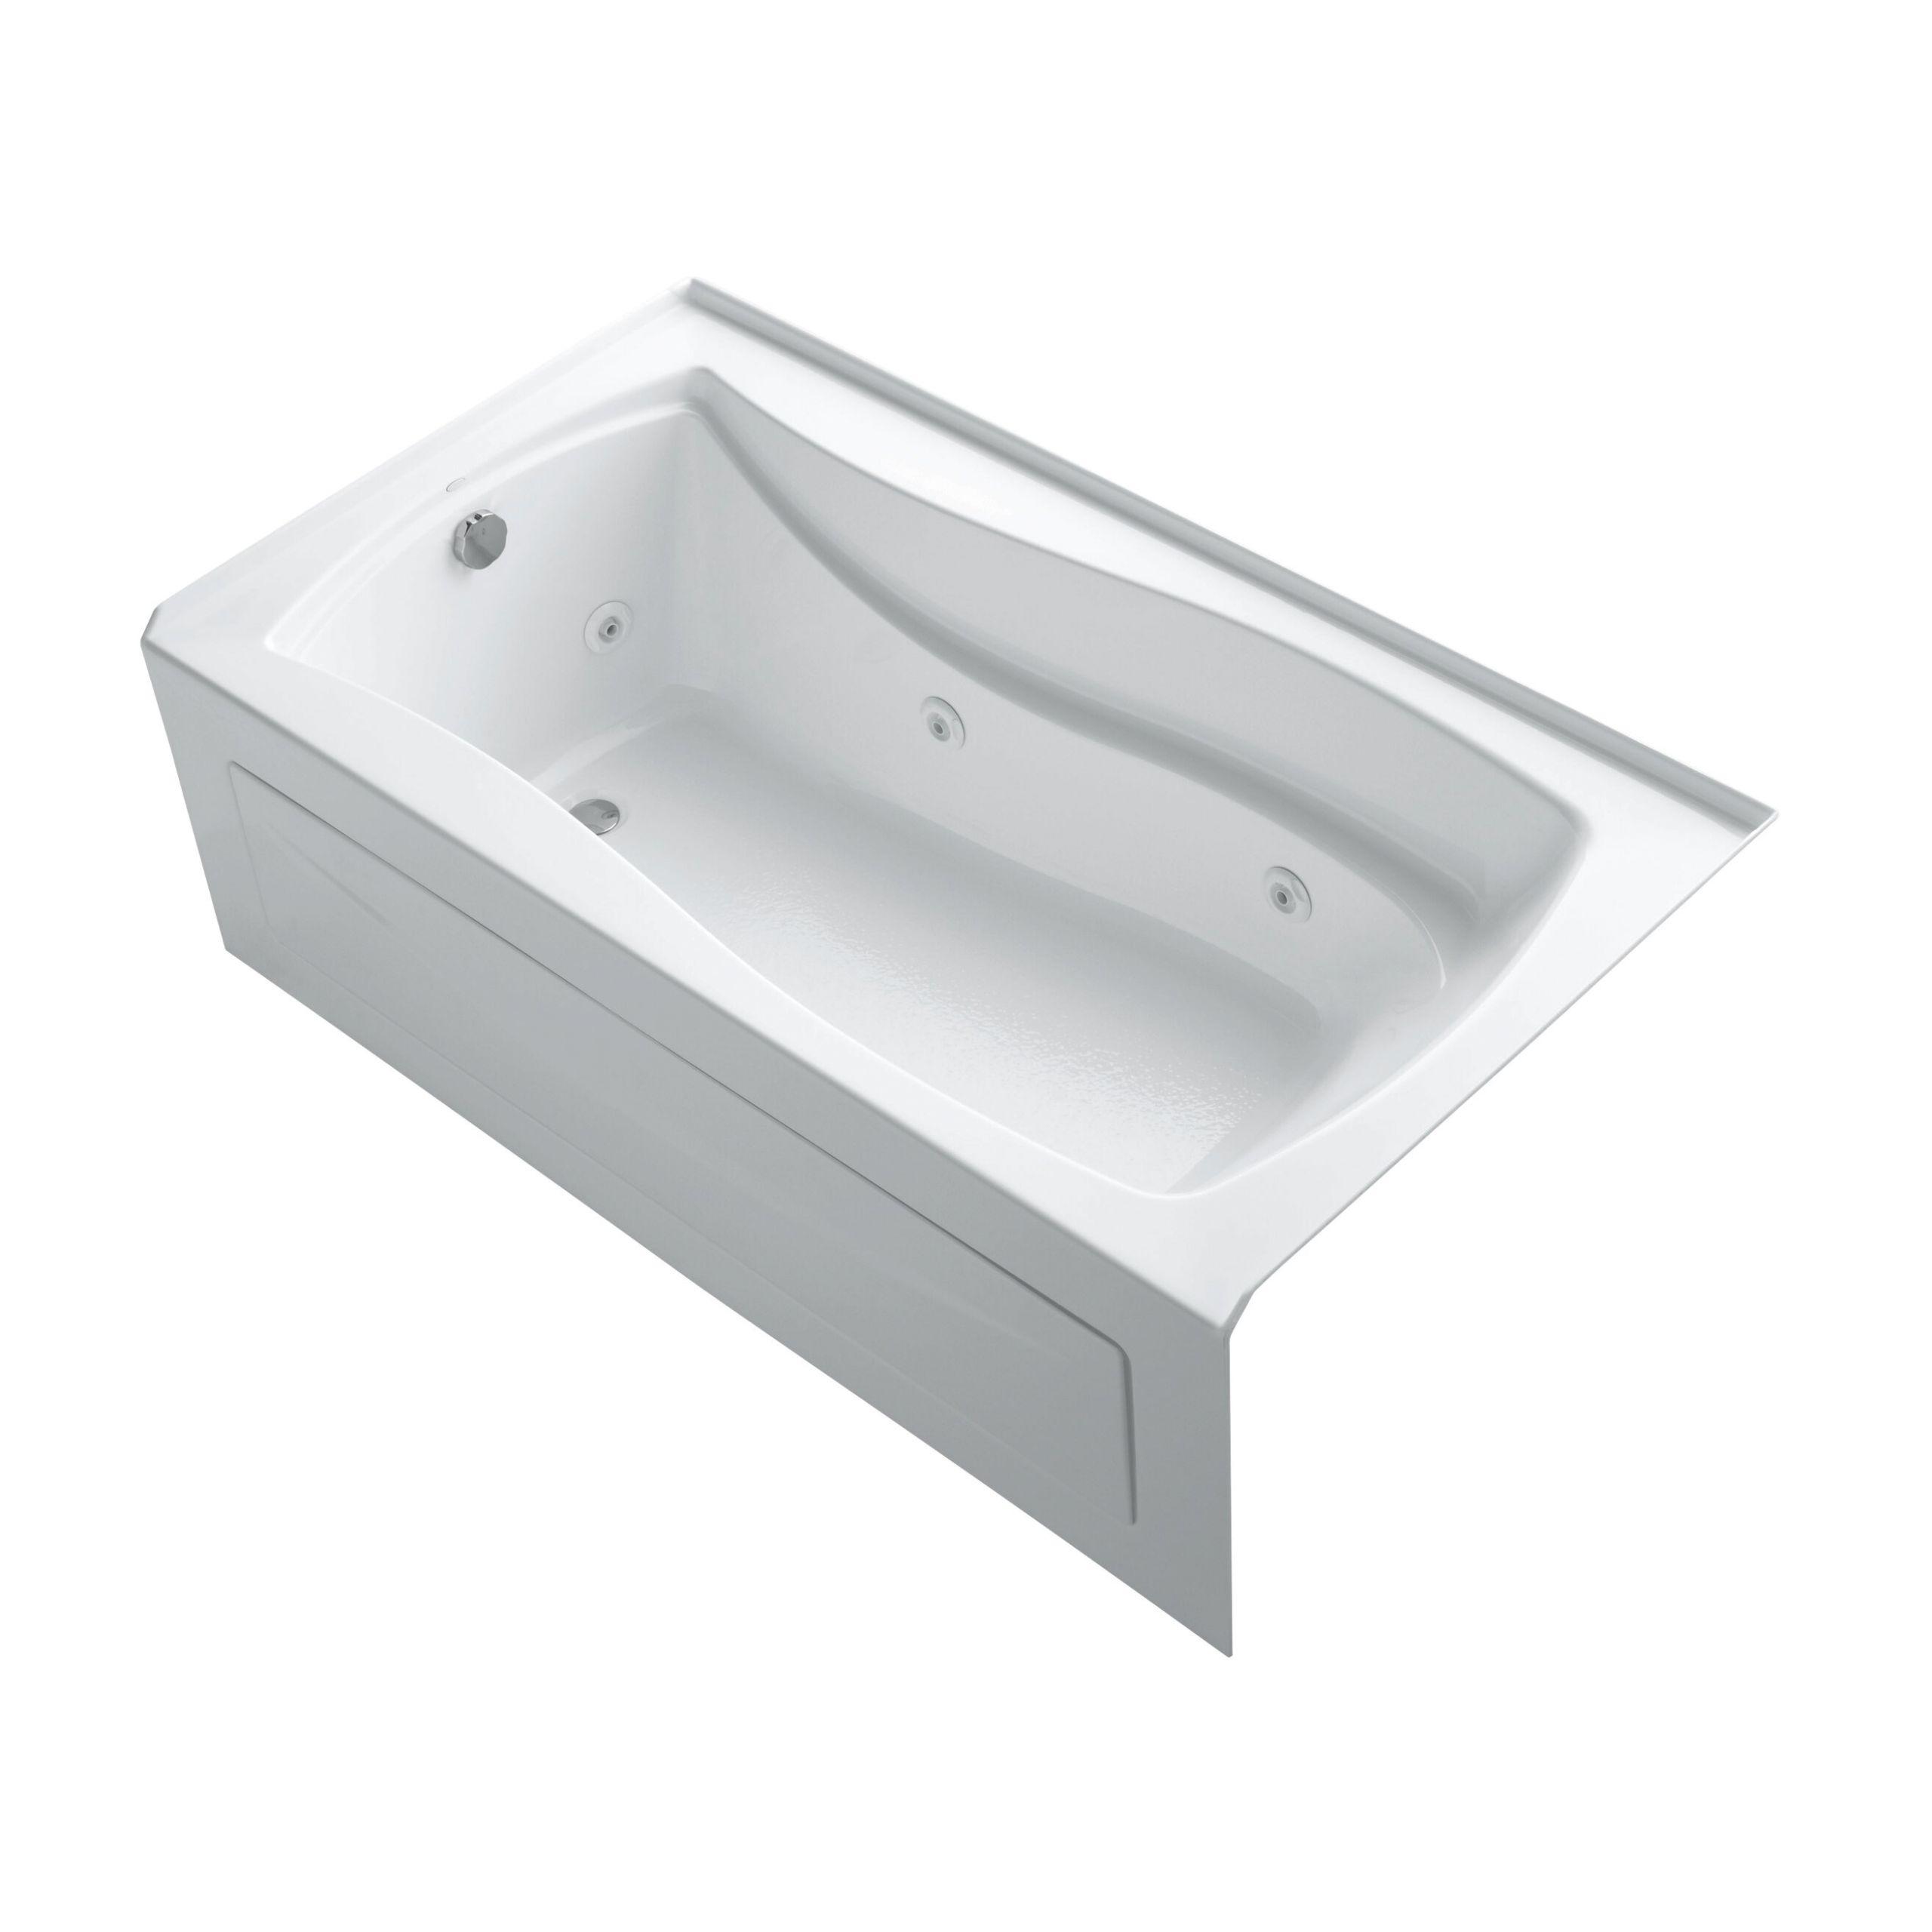 "Whirlpool Bathtub 66 X 36 Kohler Mariposa 66"" X 36"" Whirlpool Bathtub"